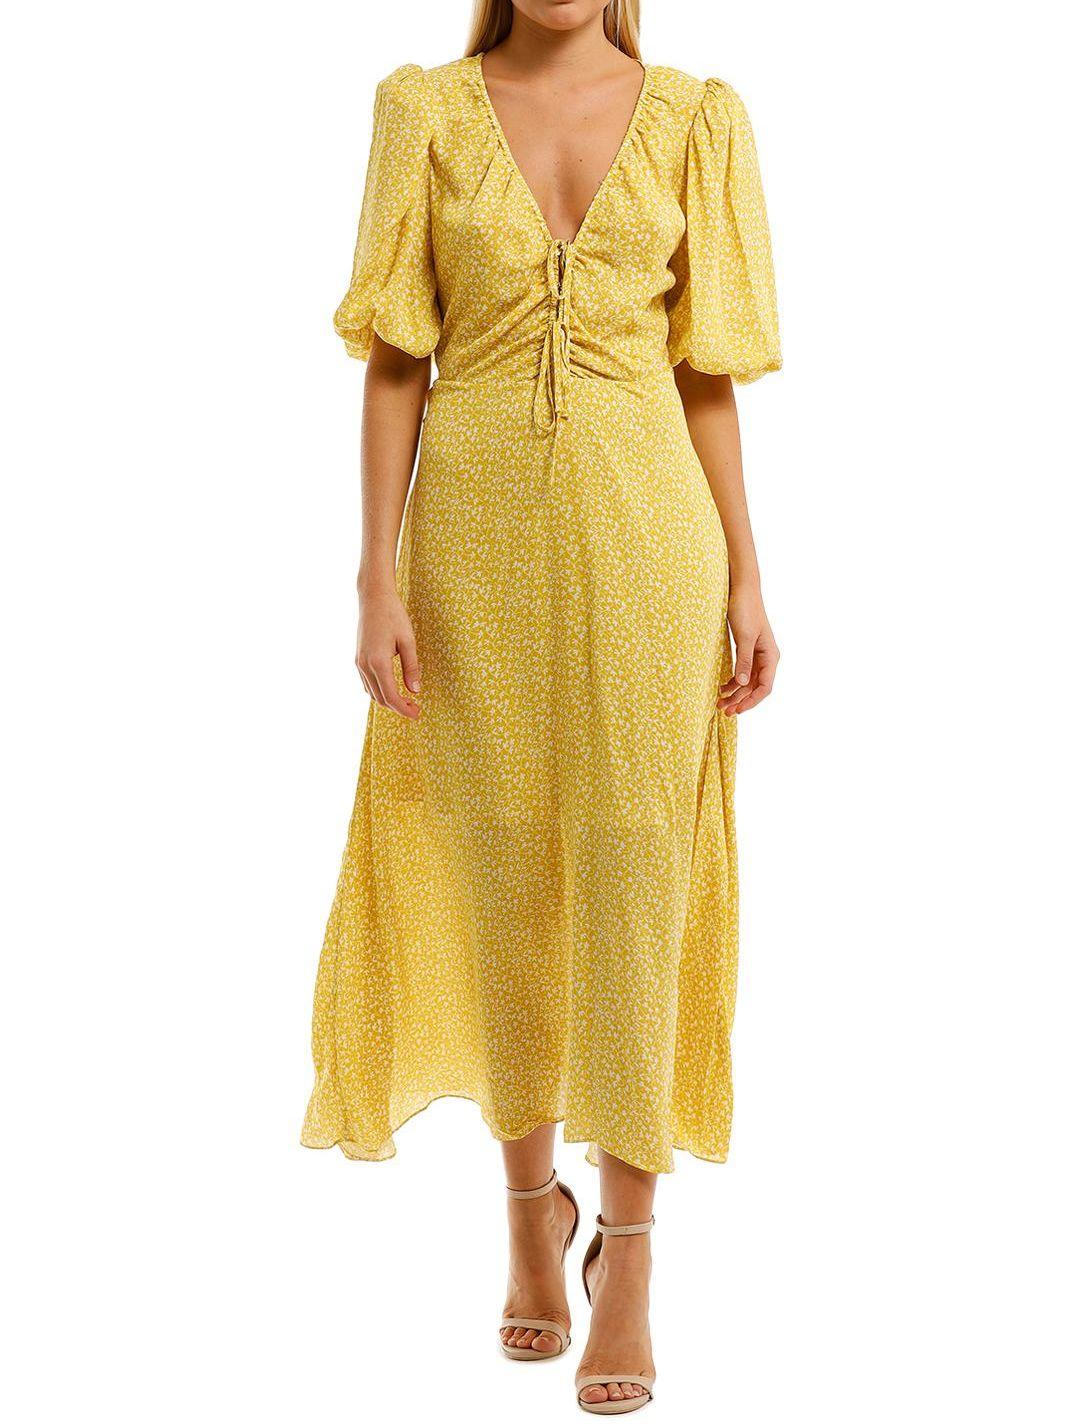 Nicholas Danielle Dress Yellow V Neckline